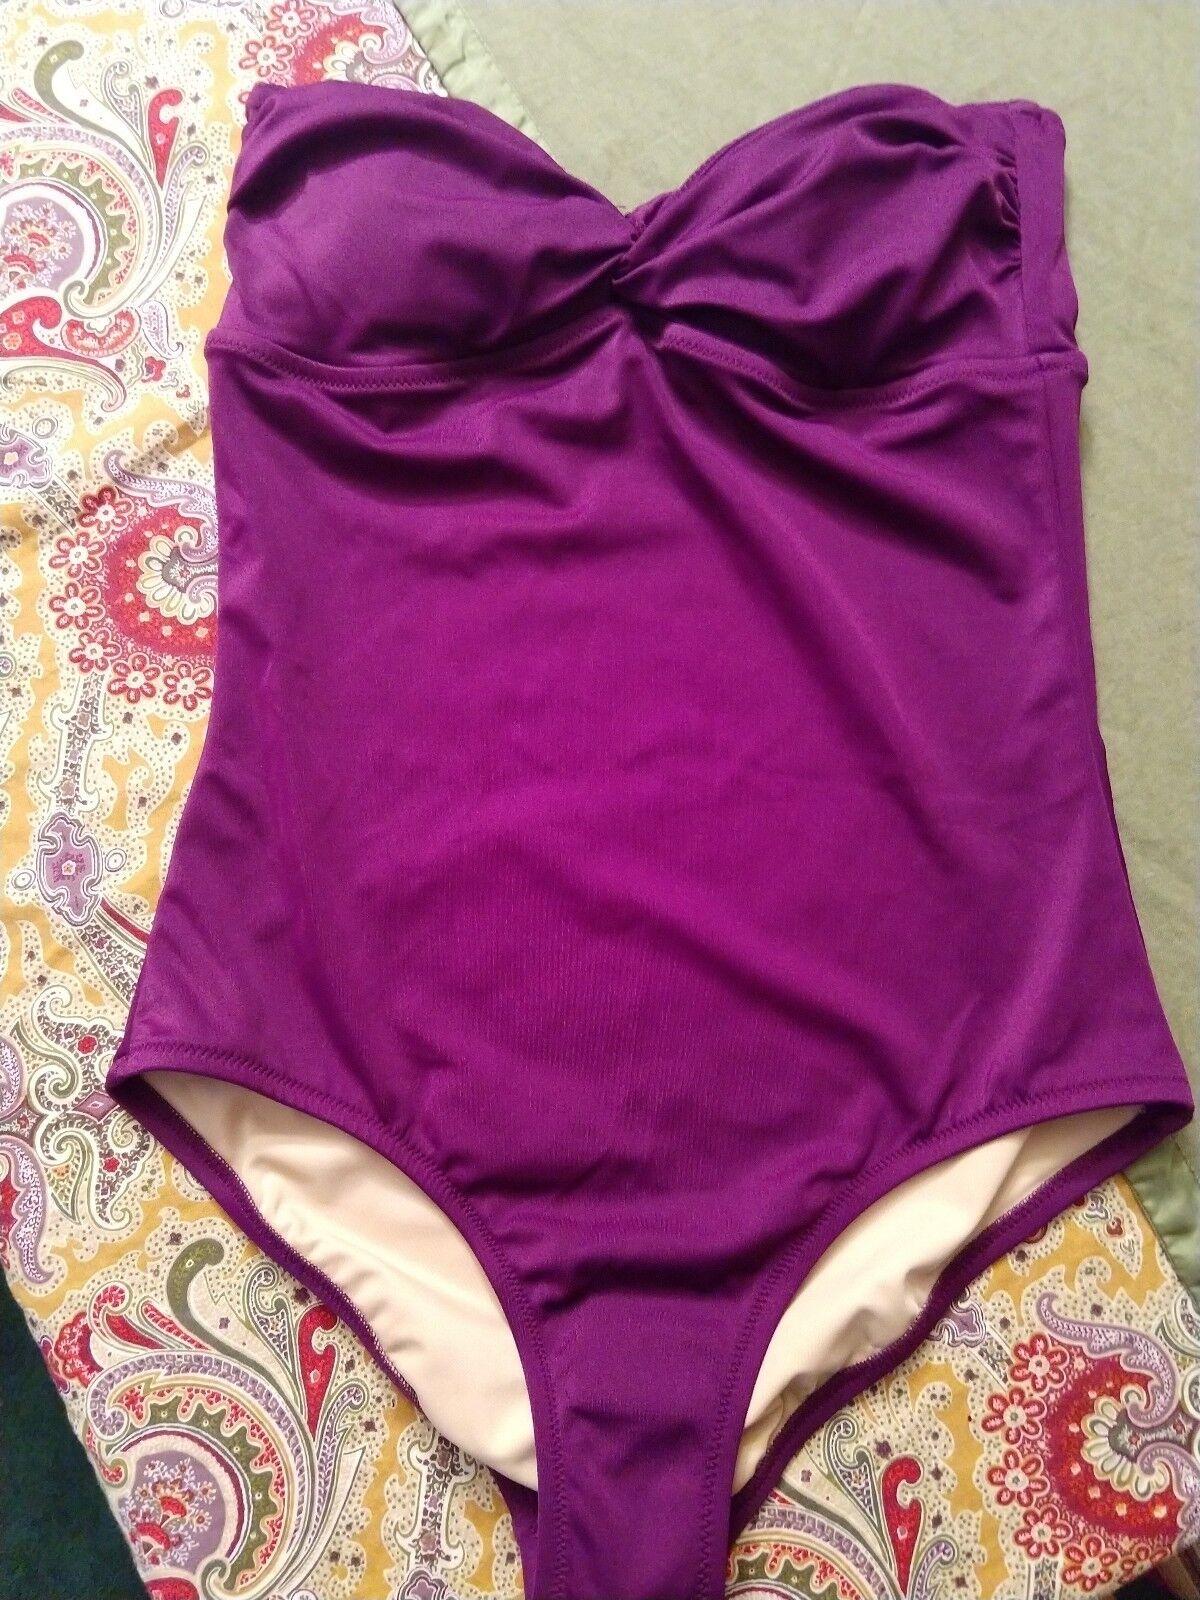 Jcrew Bathing Suit Lot Purple Navy Size 8